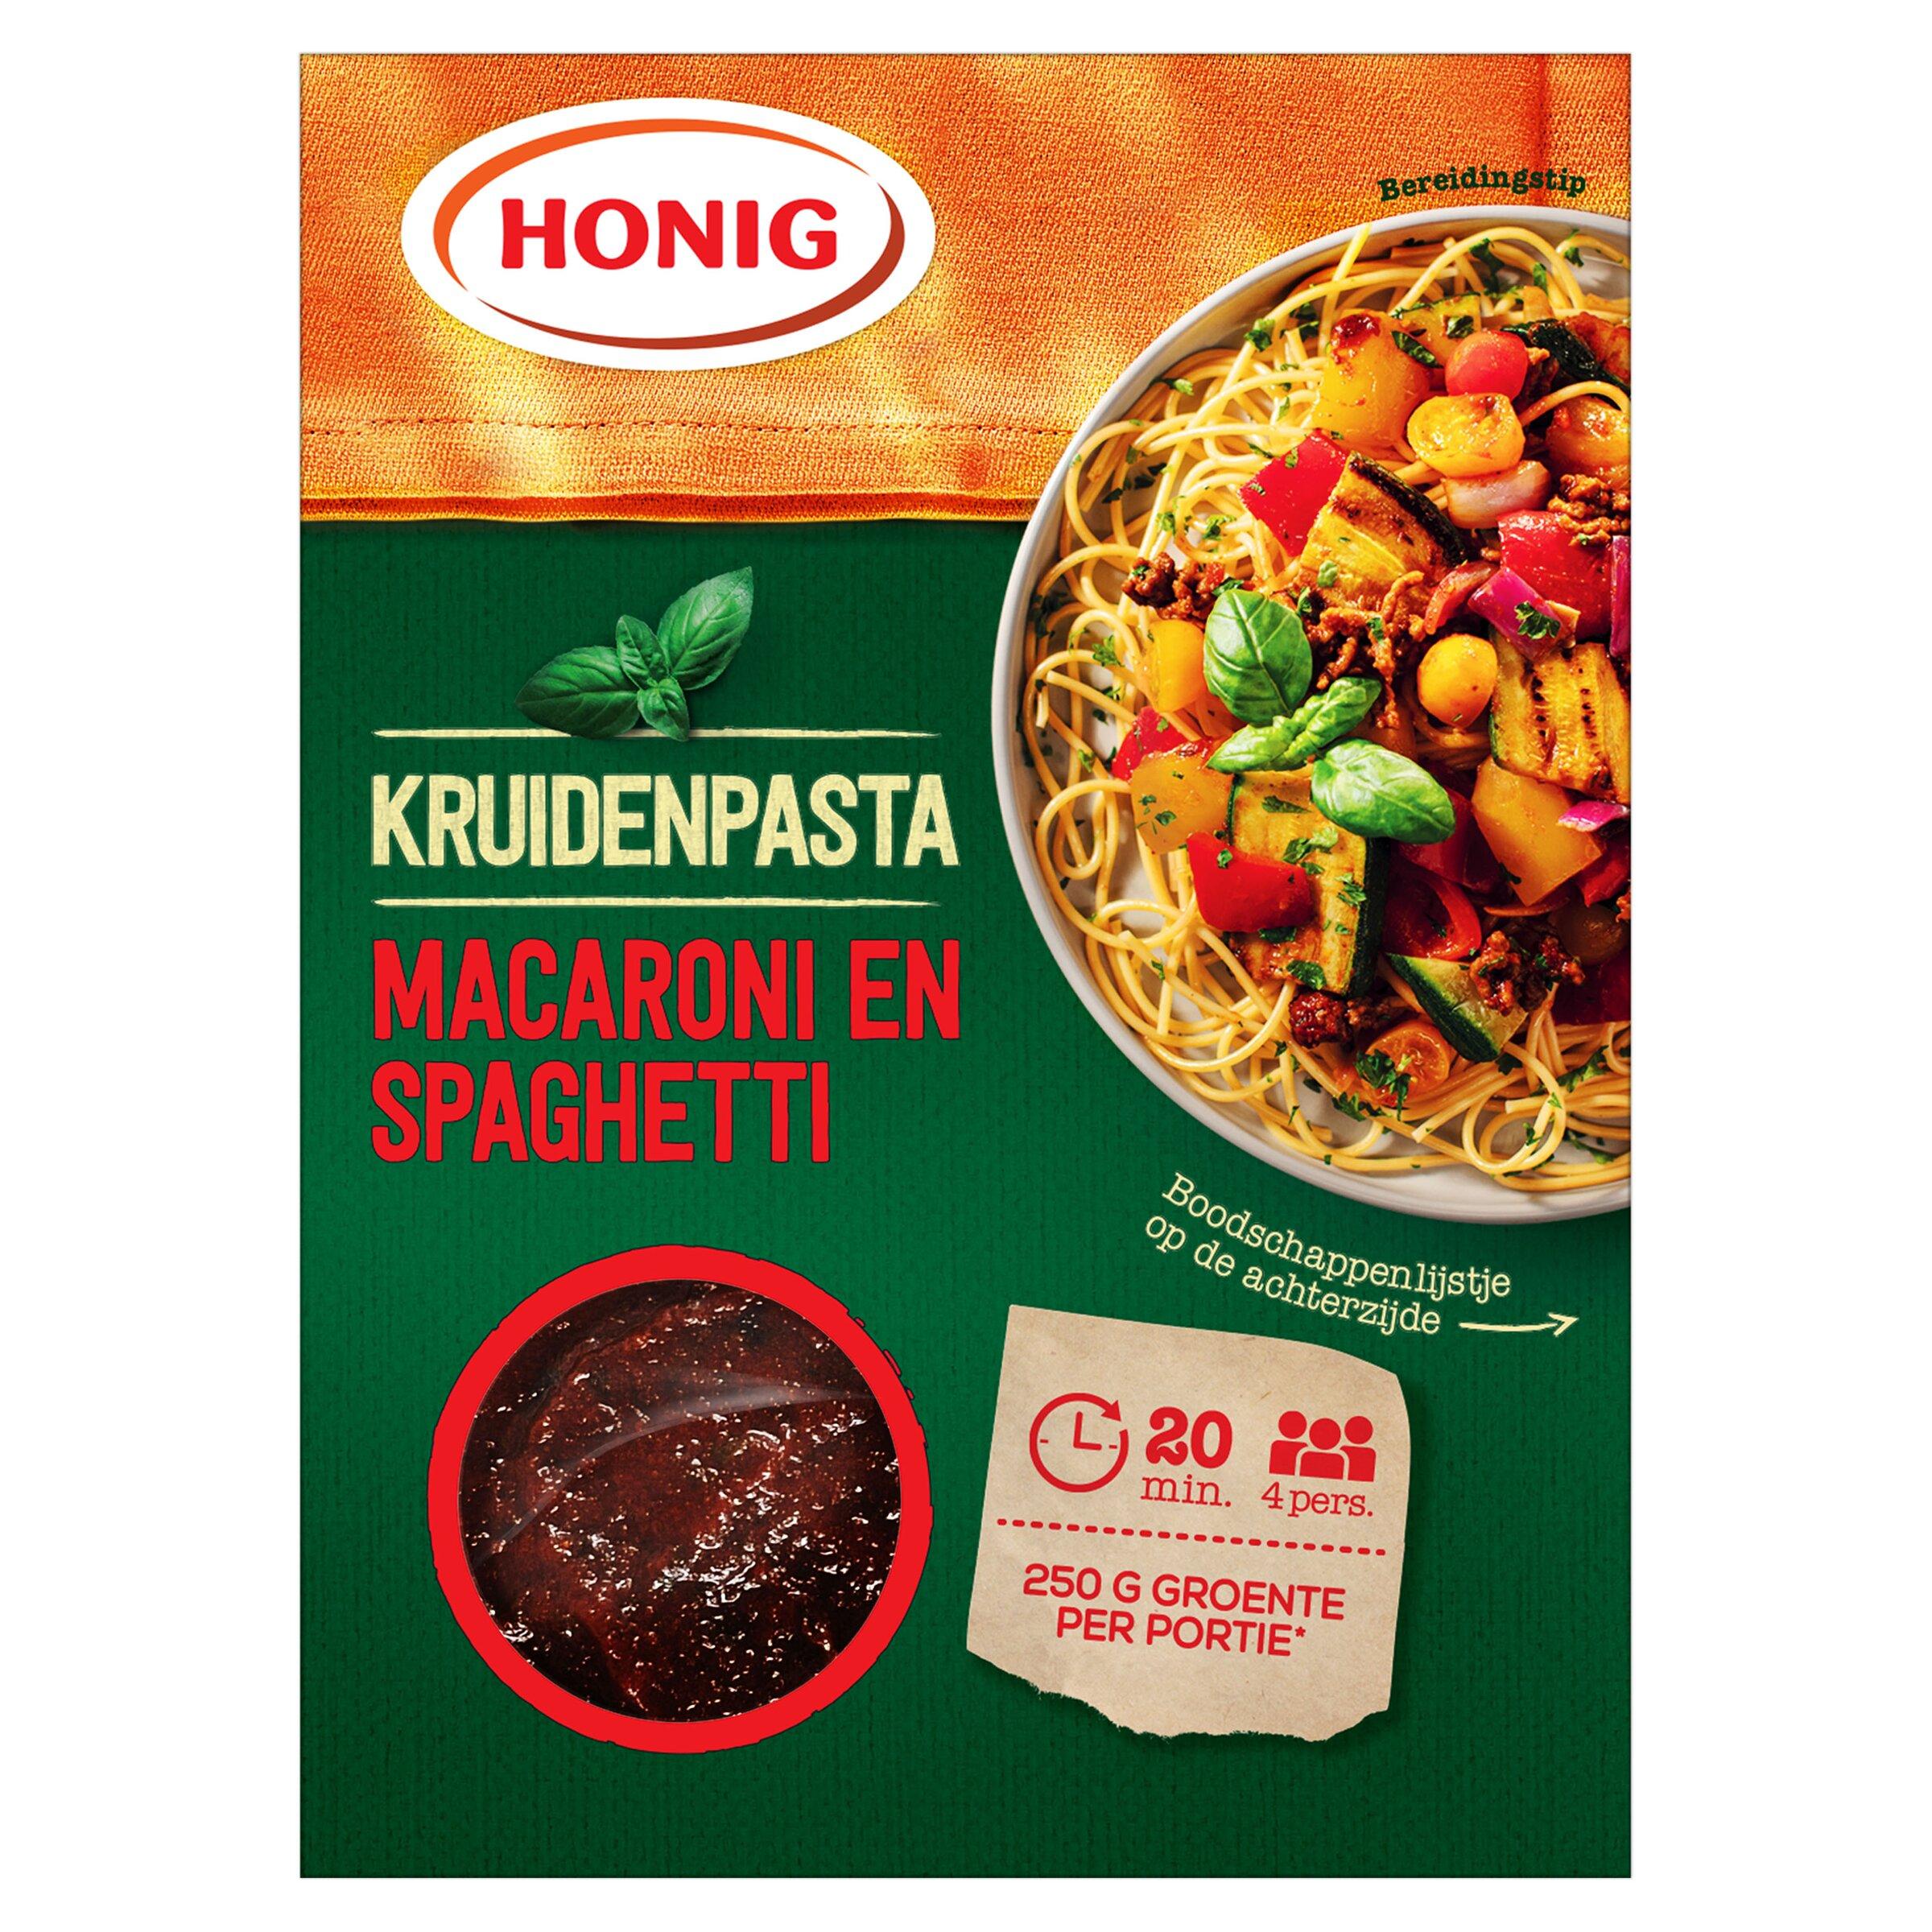 Macaroni en Spaghetti